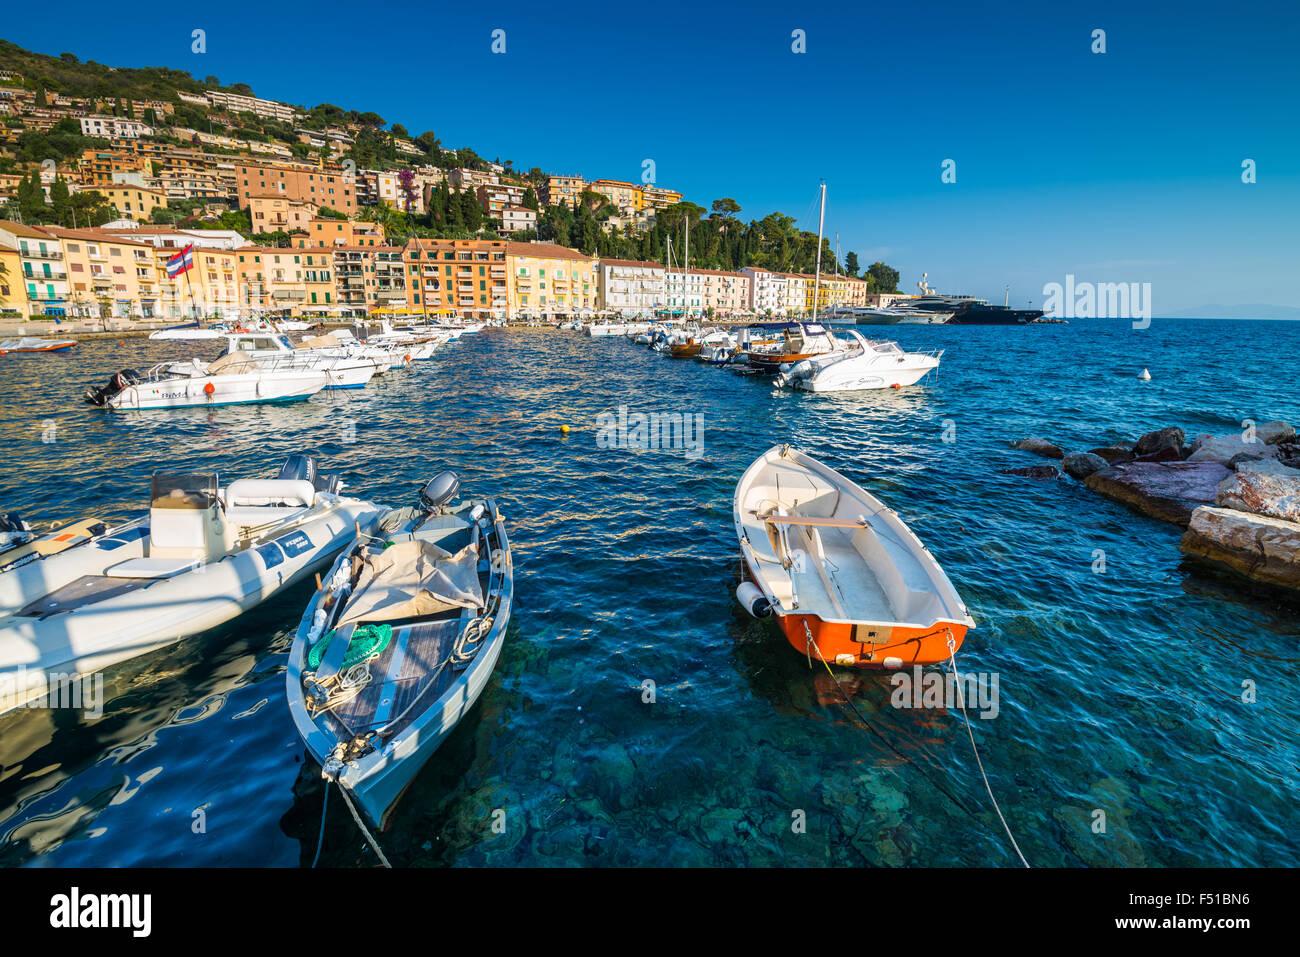 Porto Santo Stefano, Monte argentario, Province of Grosseto, Tuscany, Italy, EU, Europe. - Stock Image